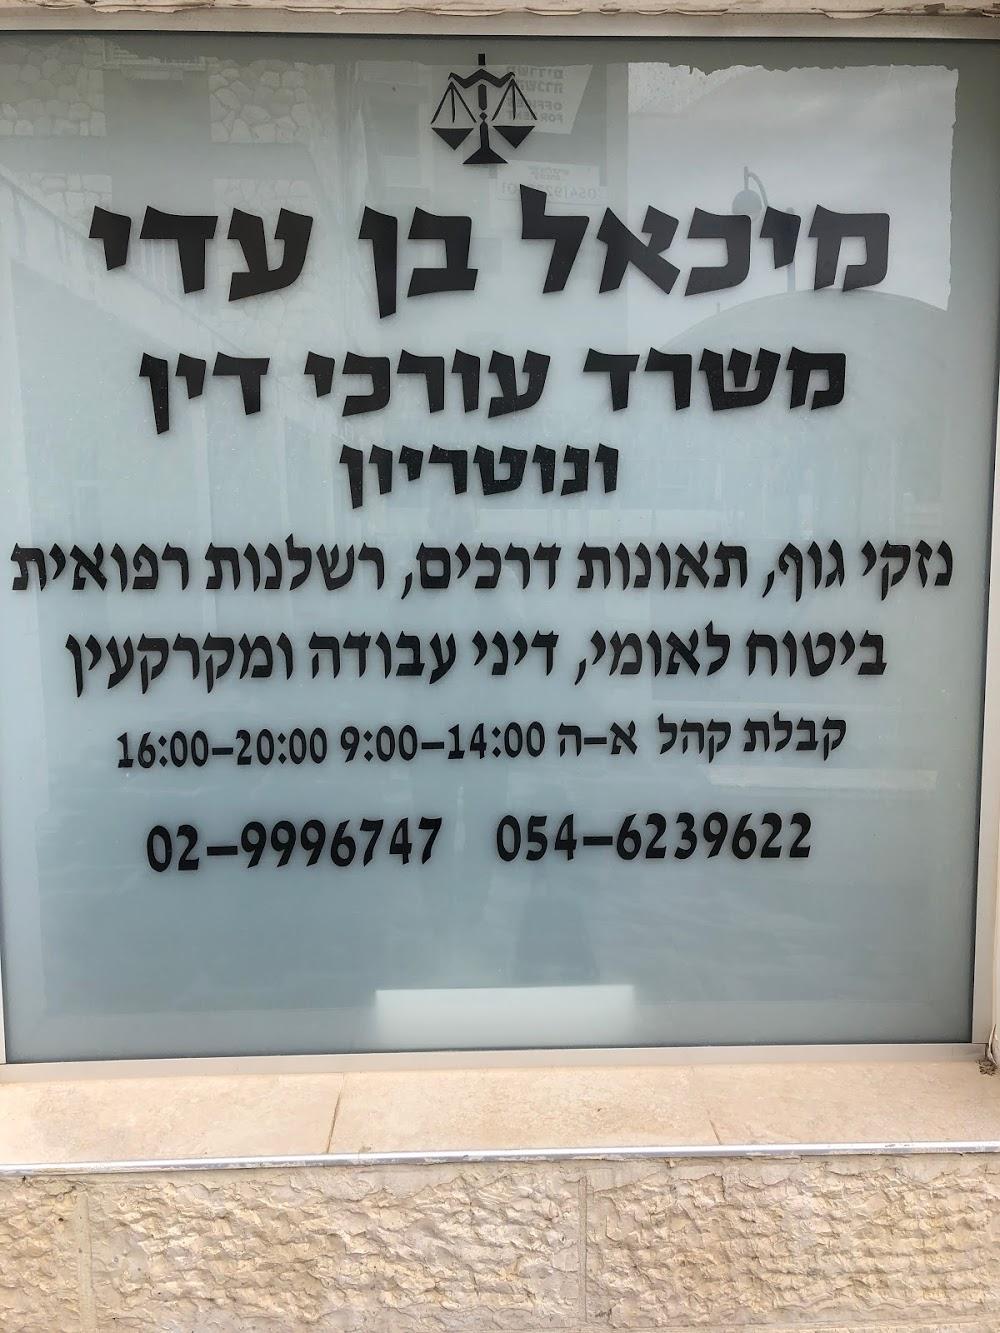 Michael Ben Adi Attorney & Notary